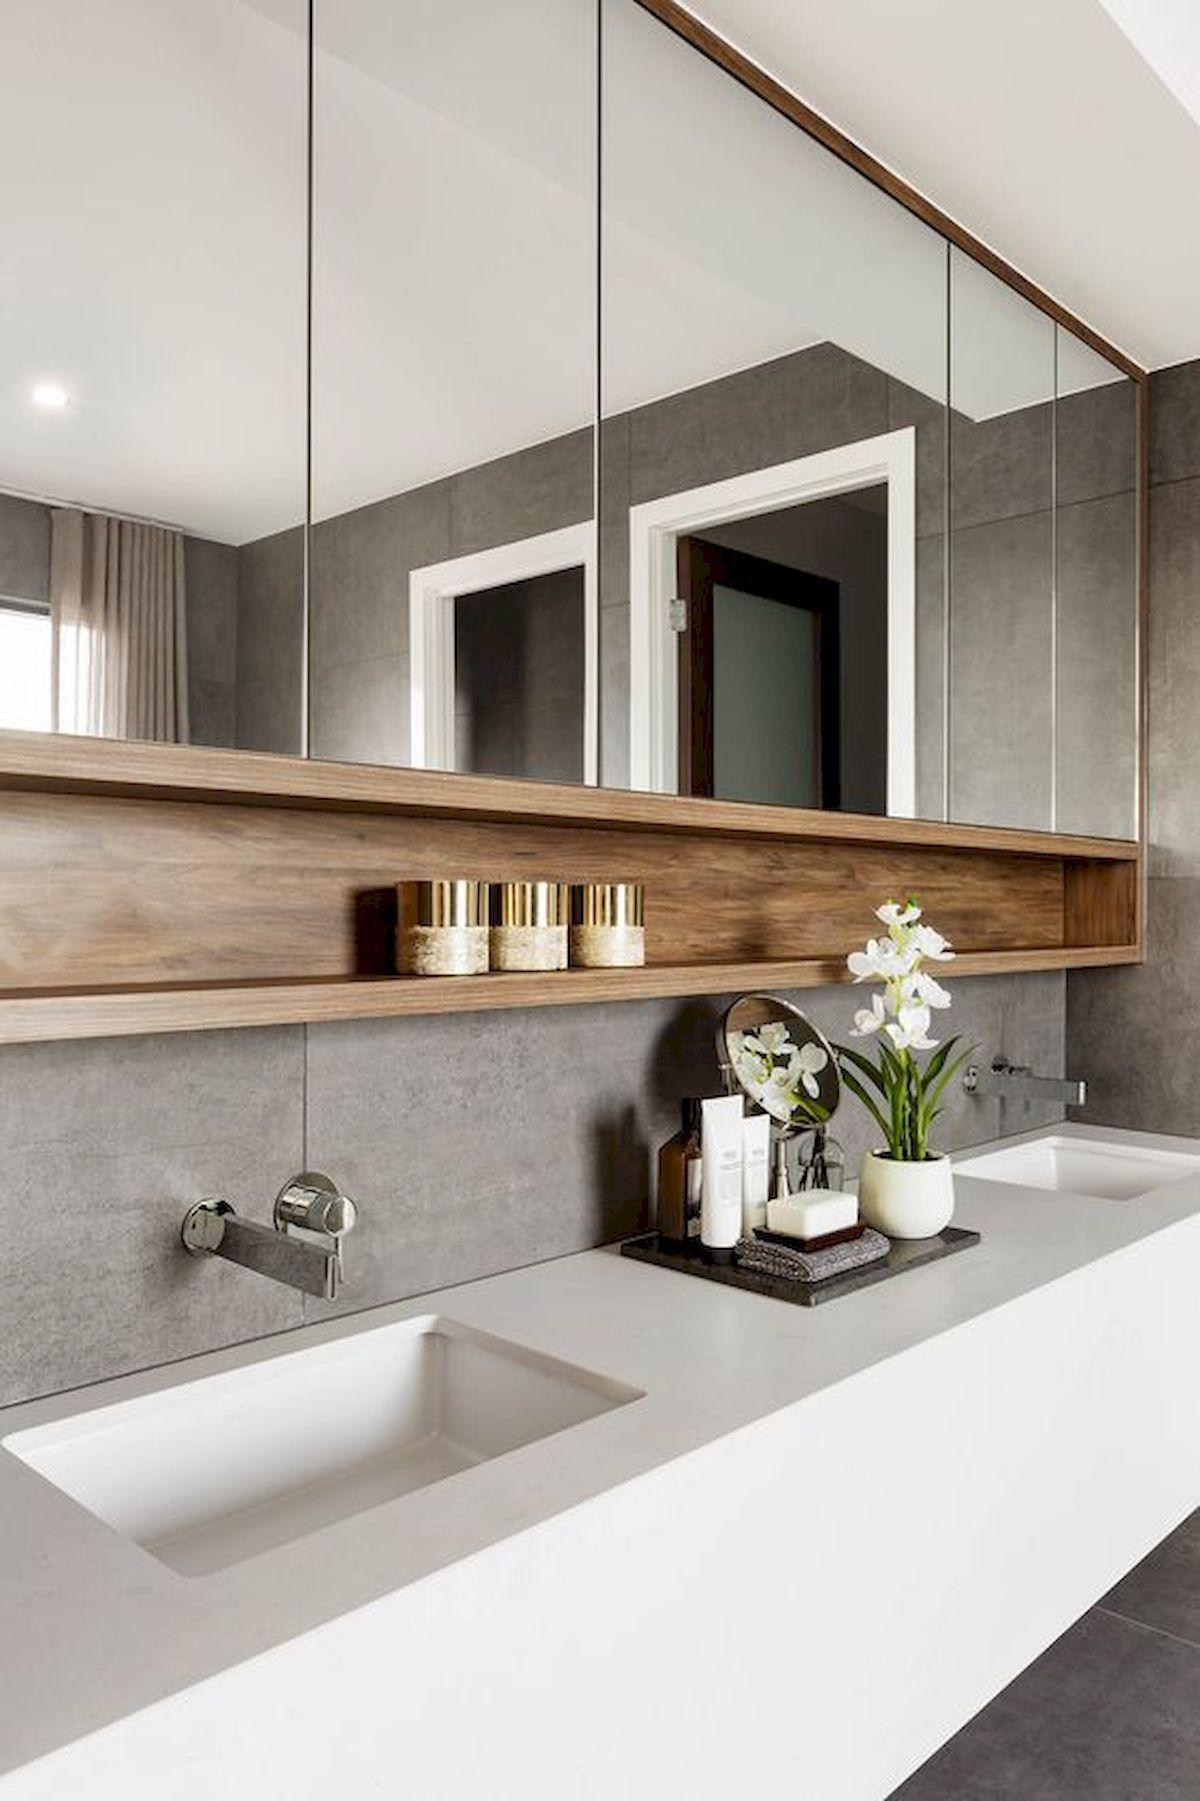 55 Stunning Farmhouse Bathroom Mirror Design Ideas And Decor Bathroom Mirror Design Farmhouse Bathroom Mirrors Classic Bathroom